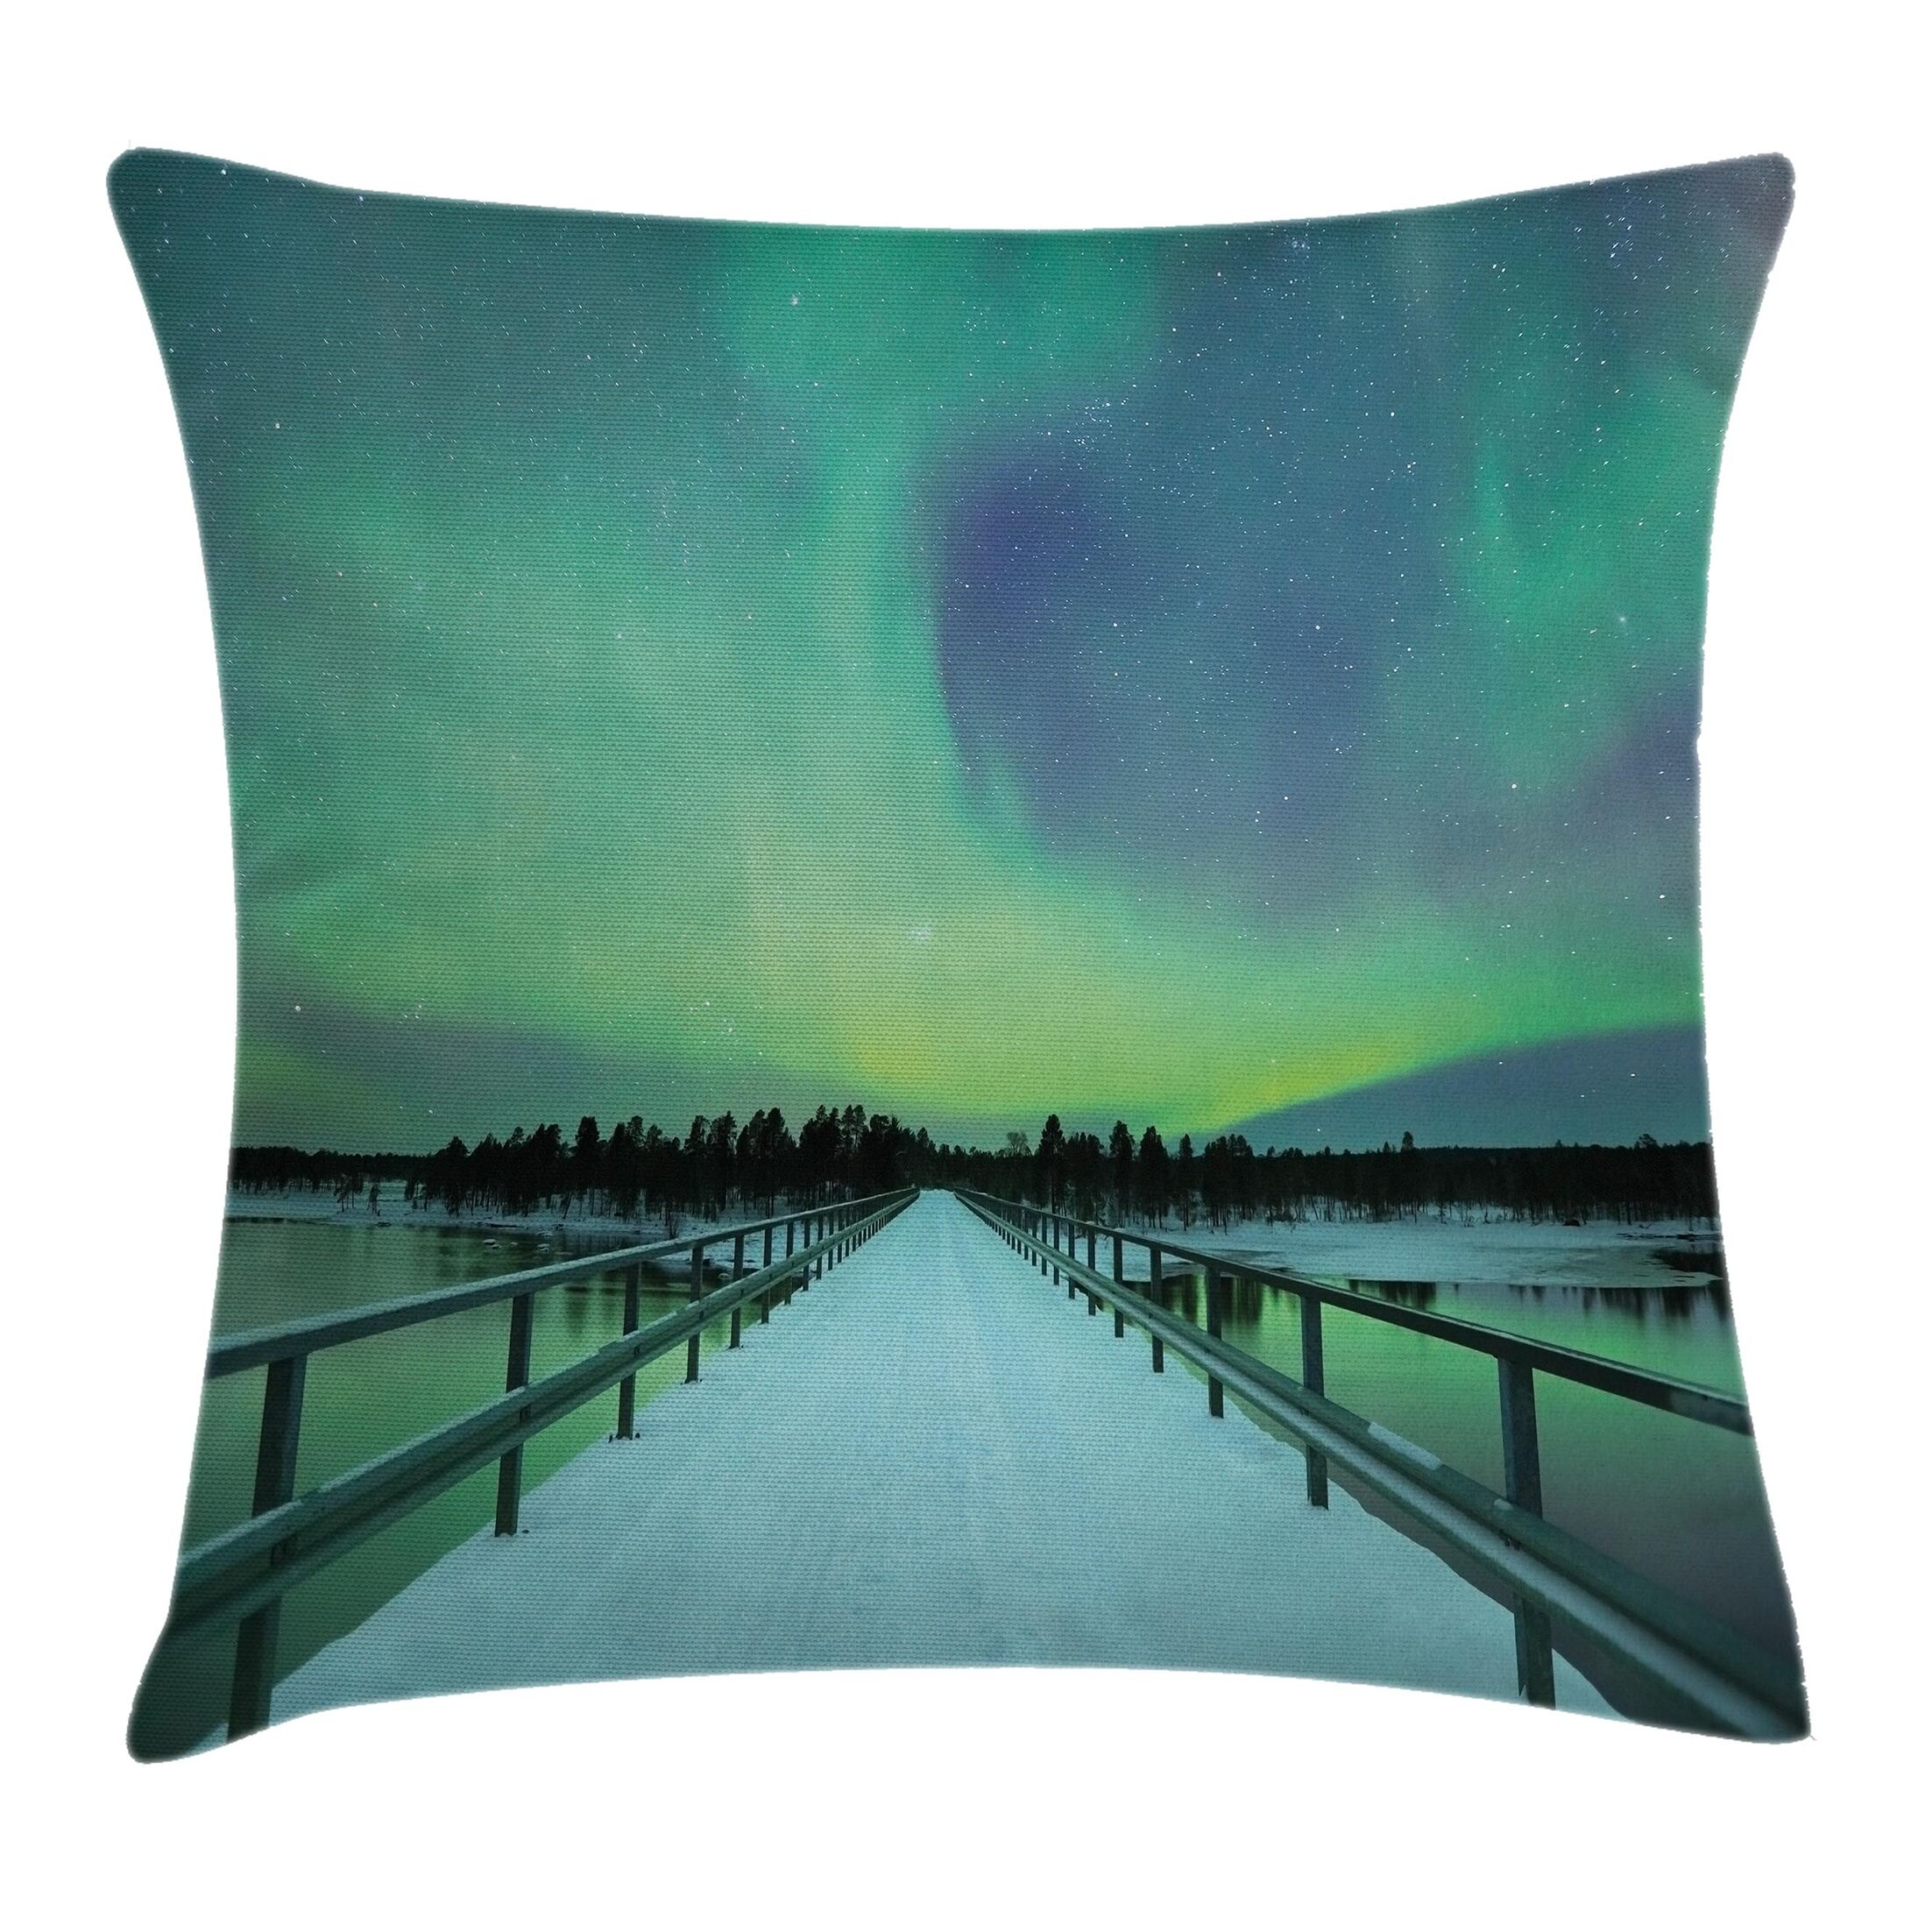 Bridge Snowy Arctic Cushion Pillow Cover Size: 24